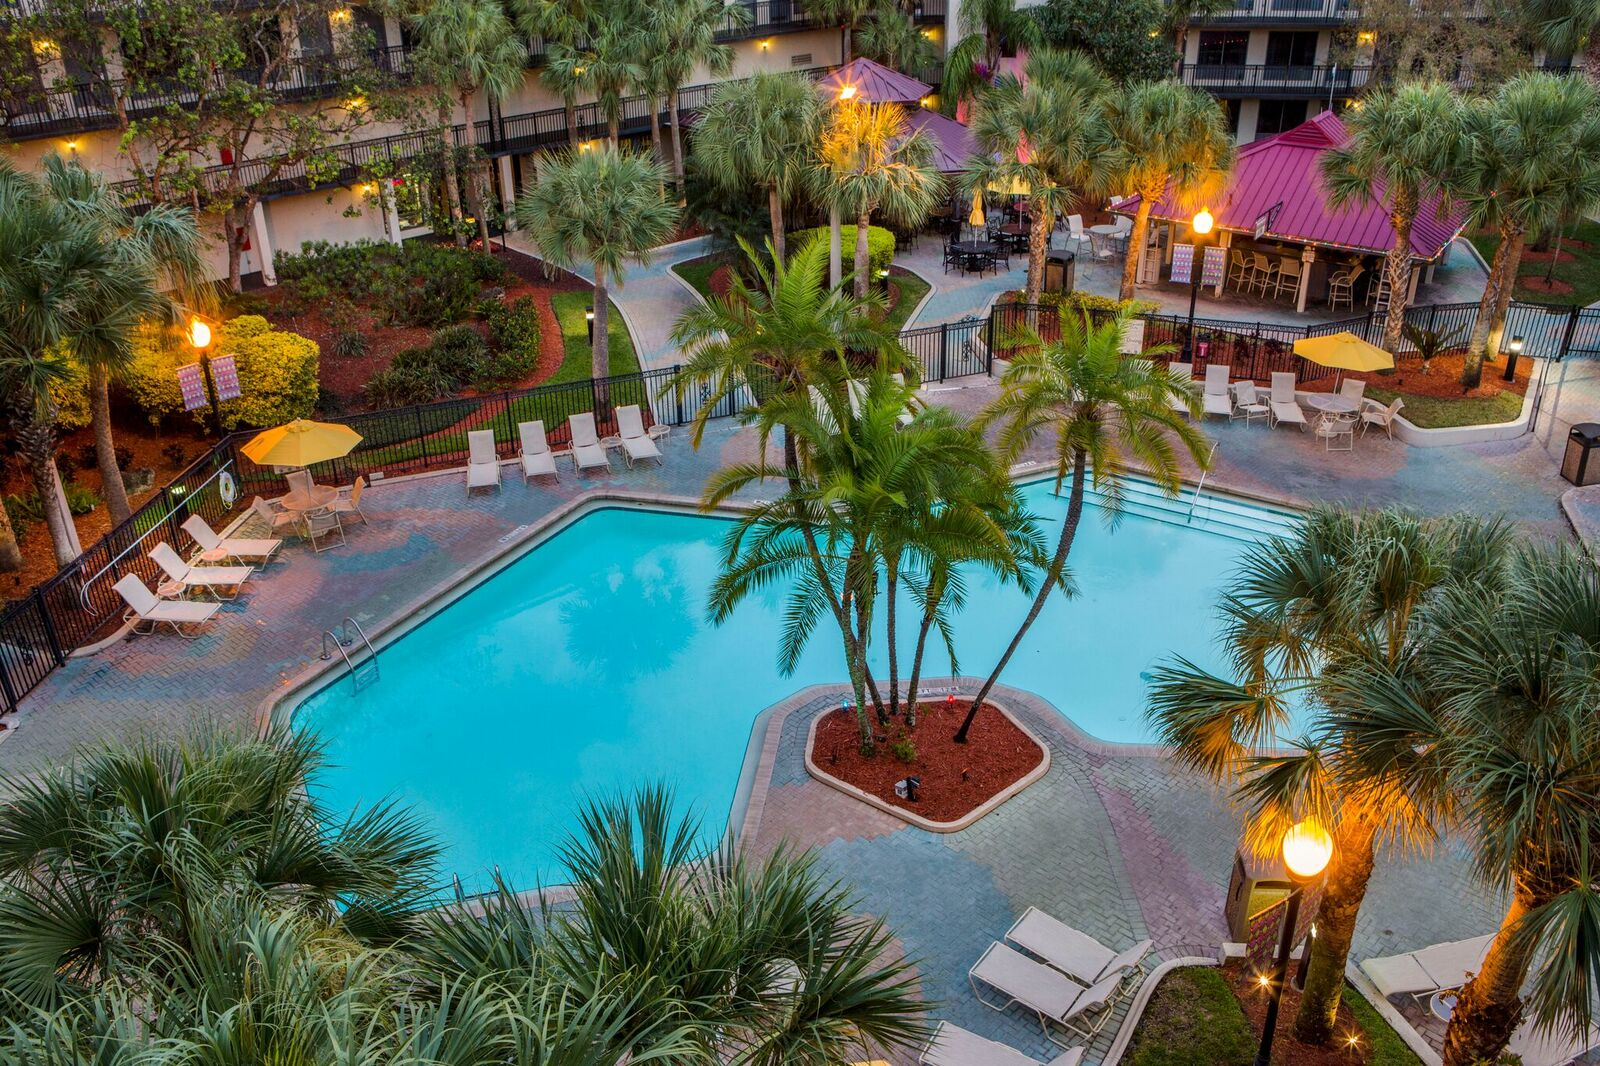 Staybridge Suites Royale Parc Orlando Tropical Pool Area 2